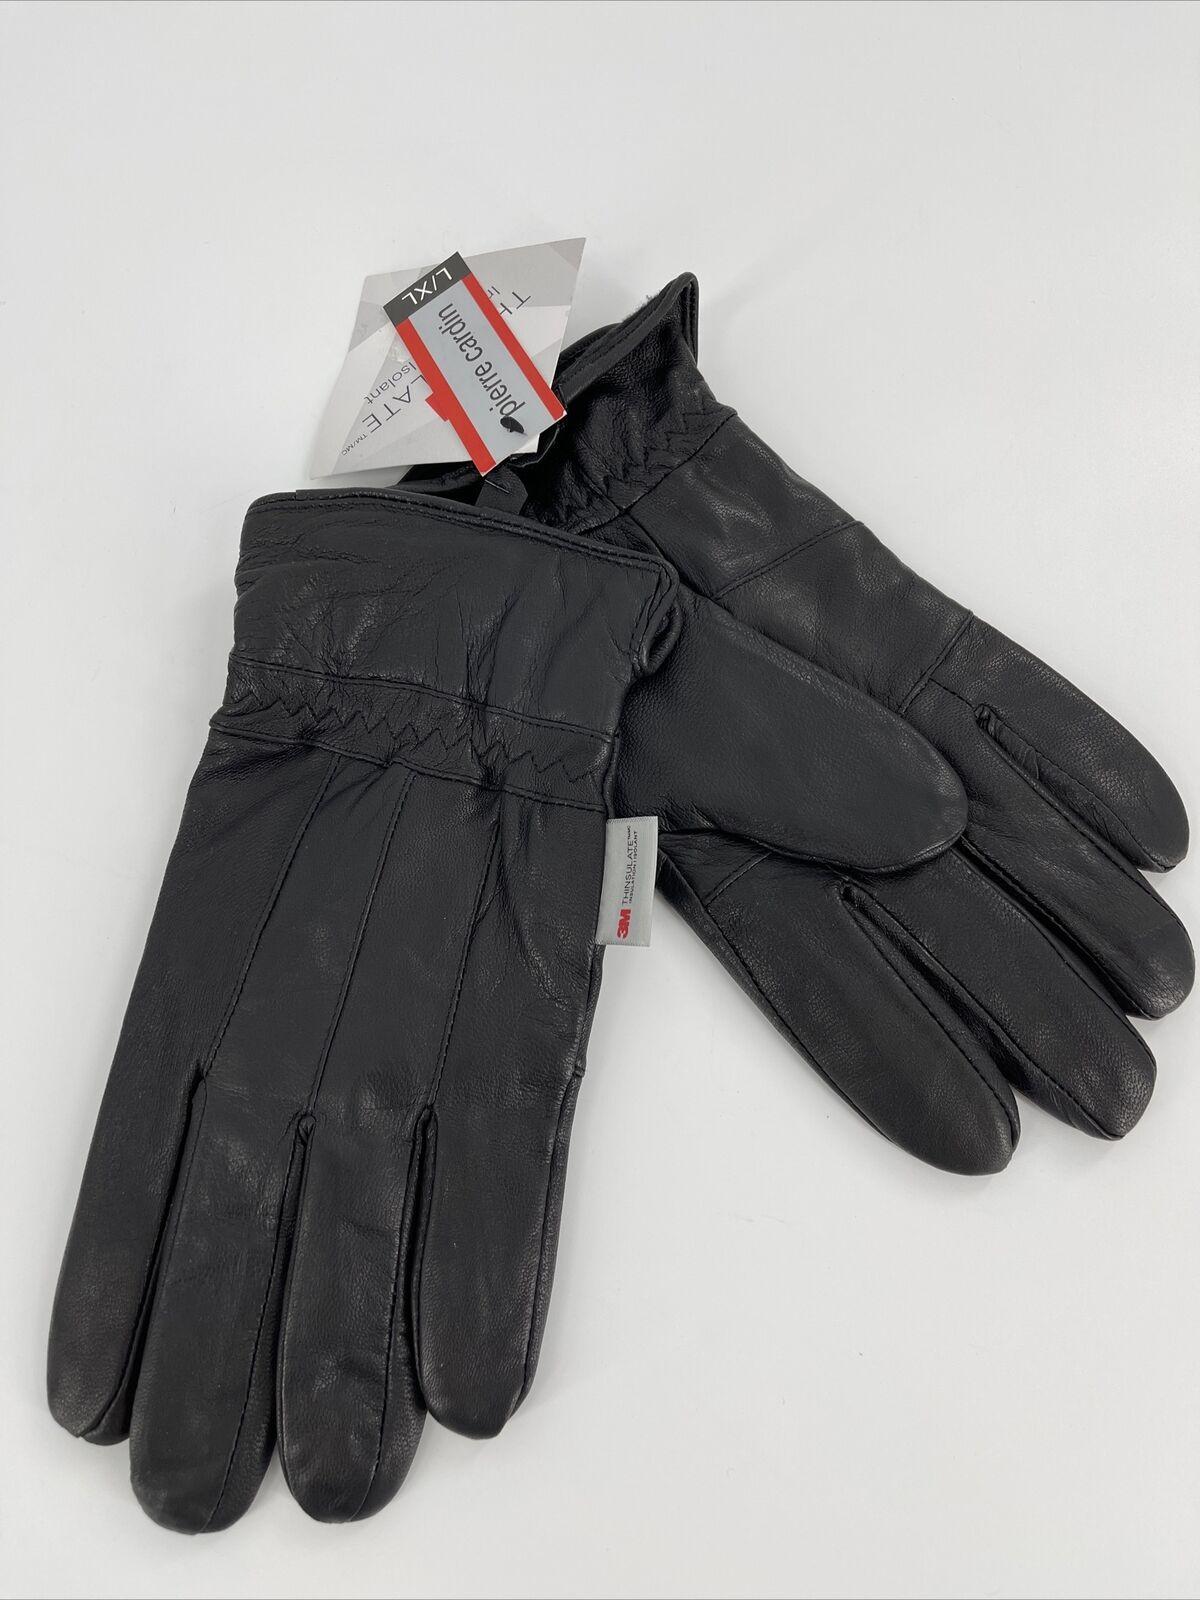 Pierre Cardin Winter Gloves Men's Gloves Size L/XL Insulated Ski 3M New #63